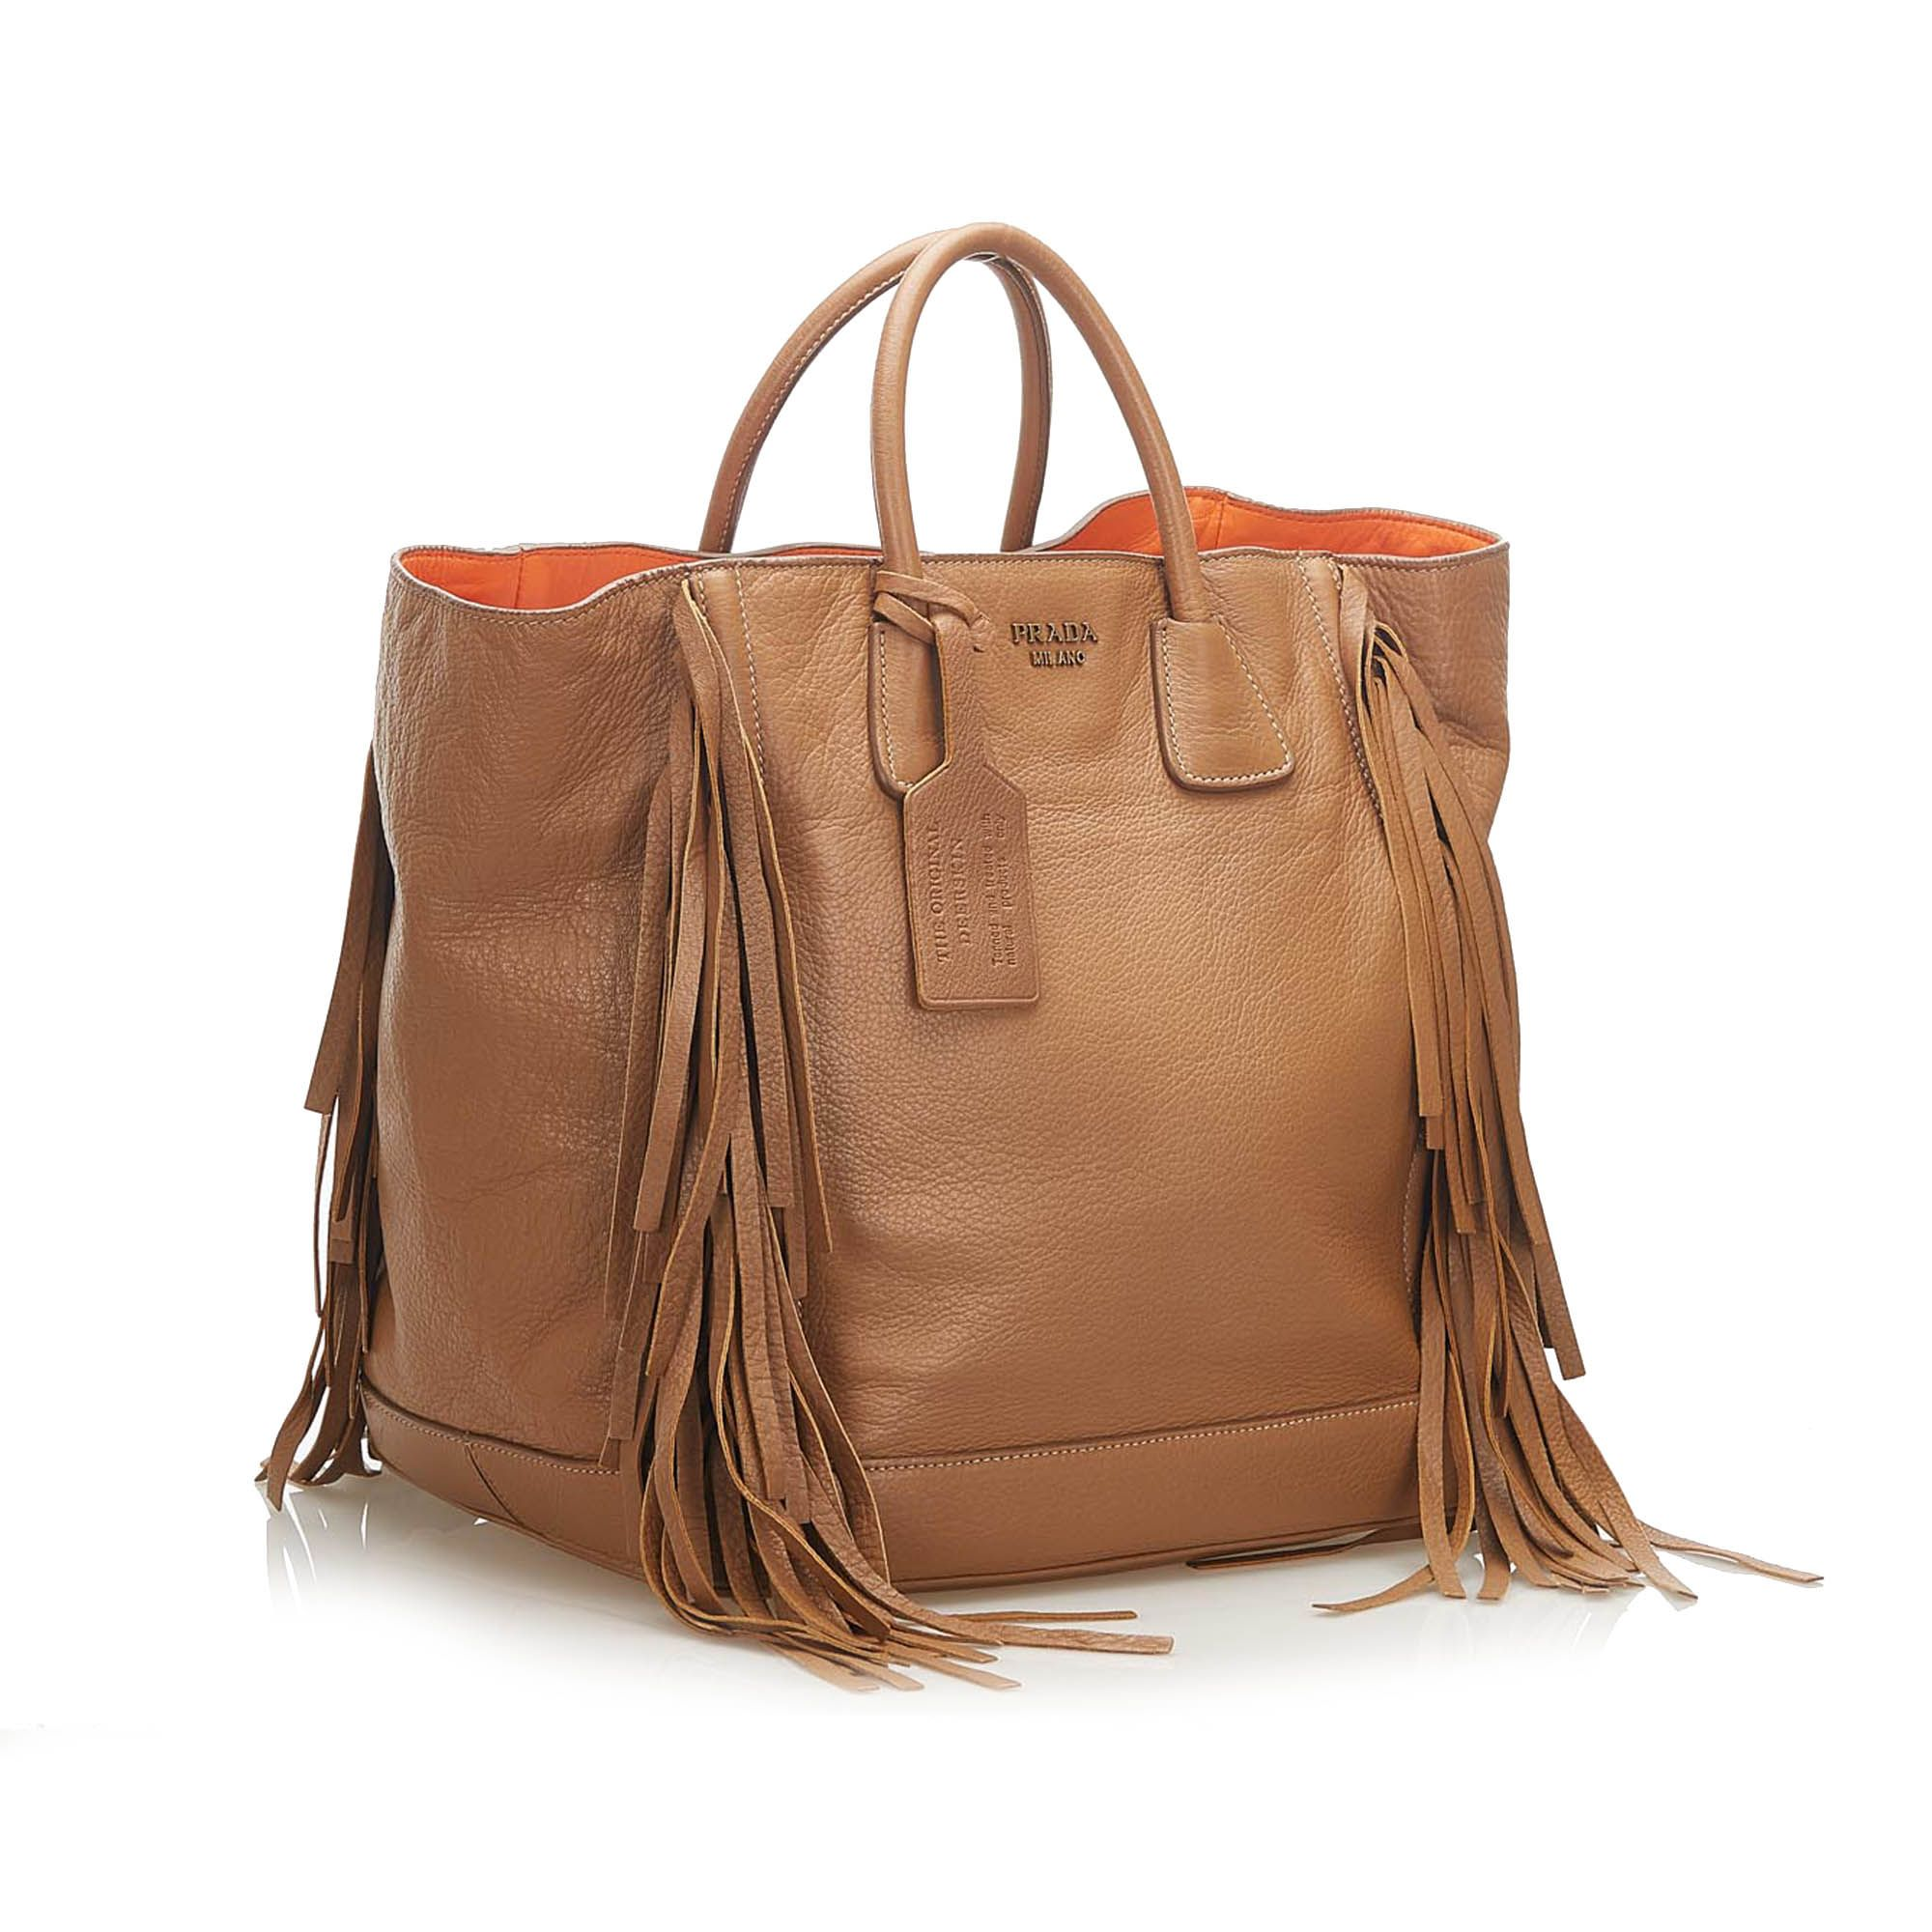 Vintage Prada Fringe Leather Tote Bag Brown